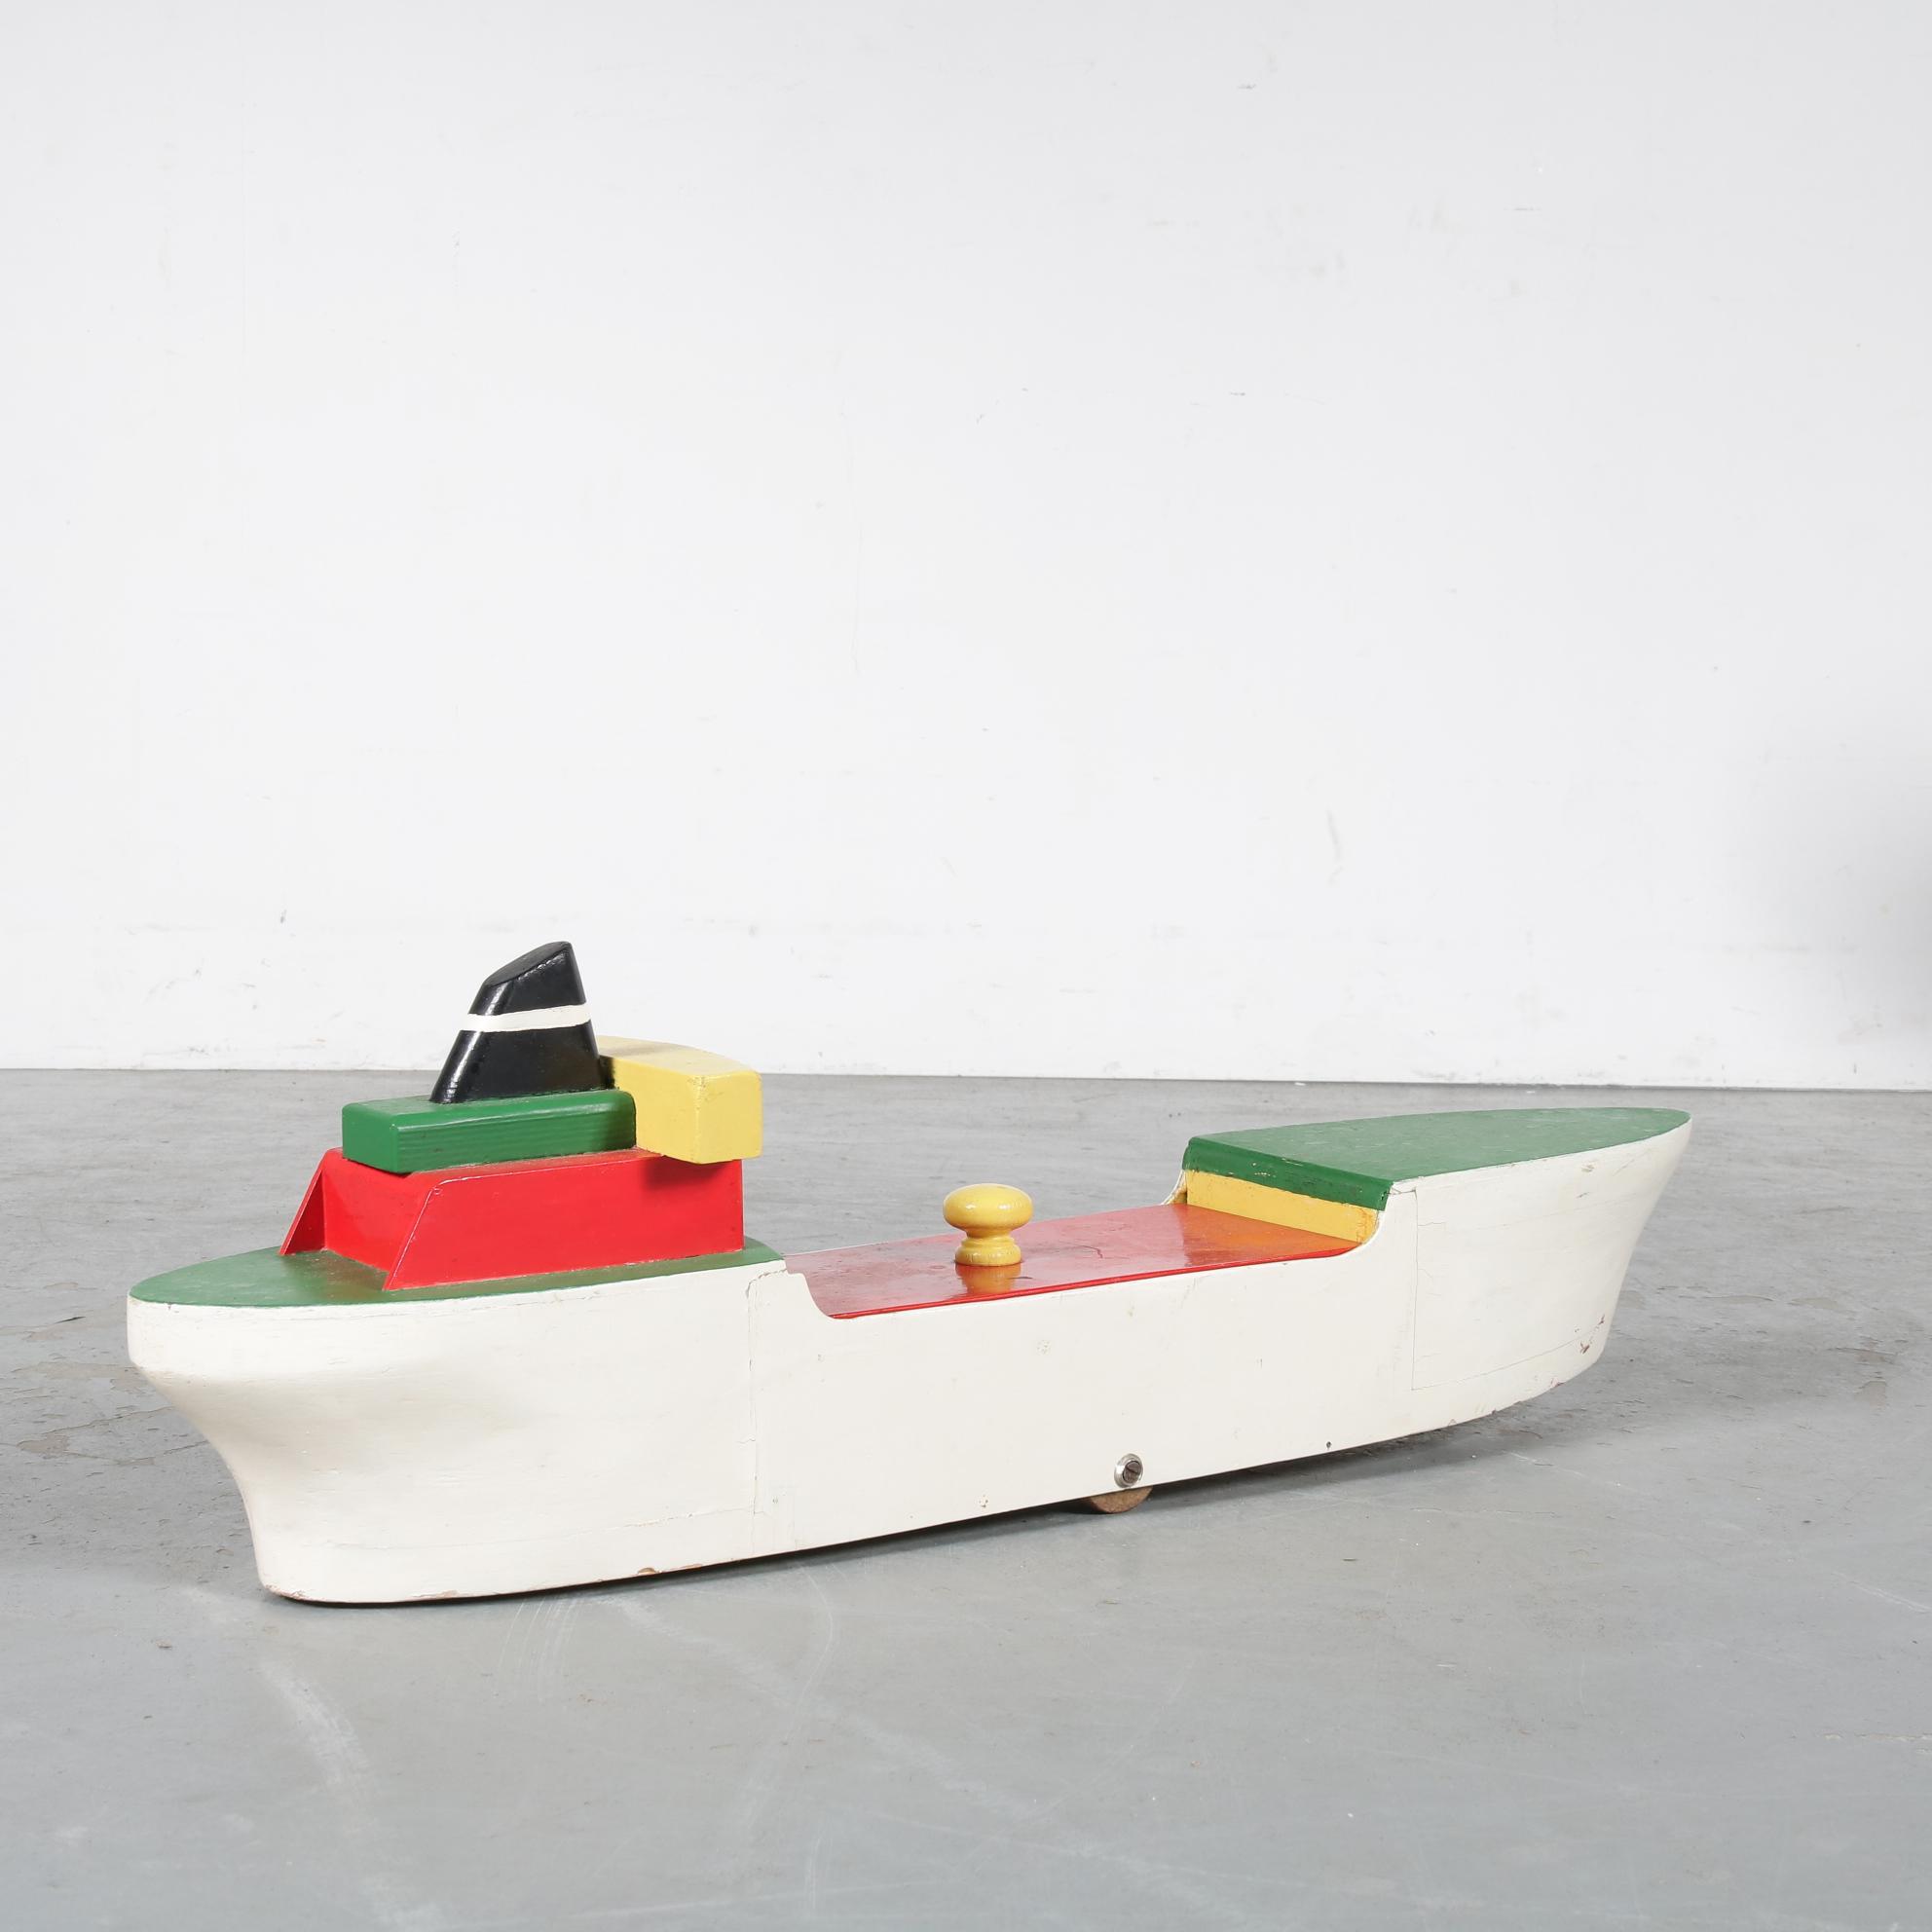 K3645 1950s Wooden toy / storage boat